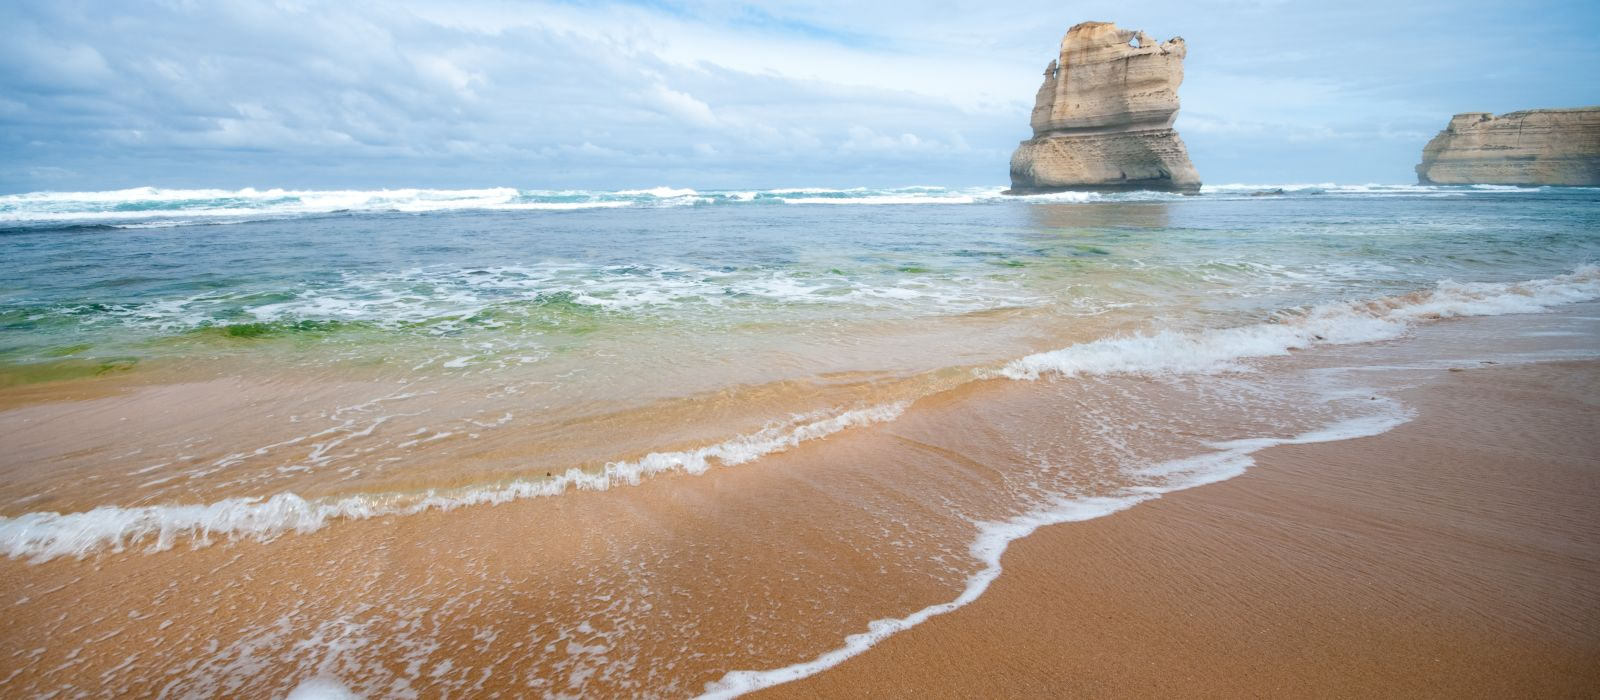 Destination Port Douglas Australia